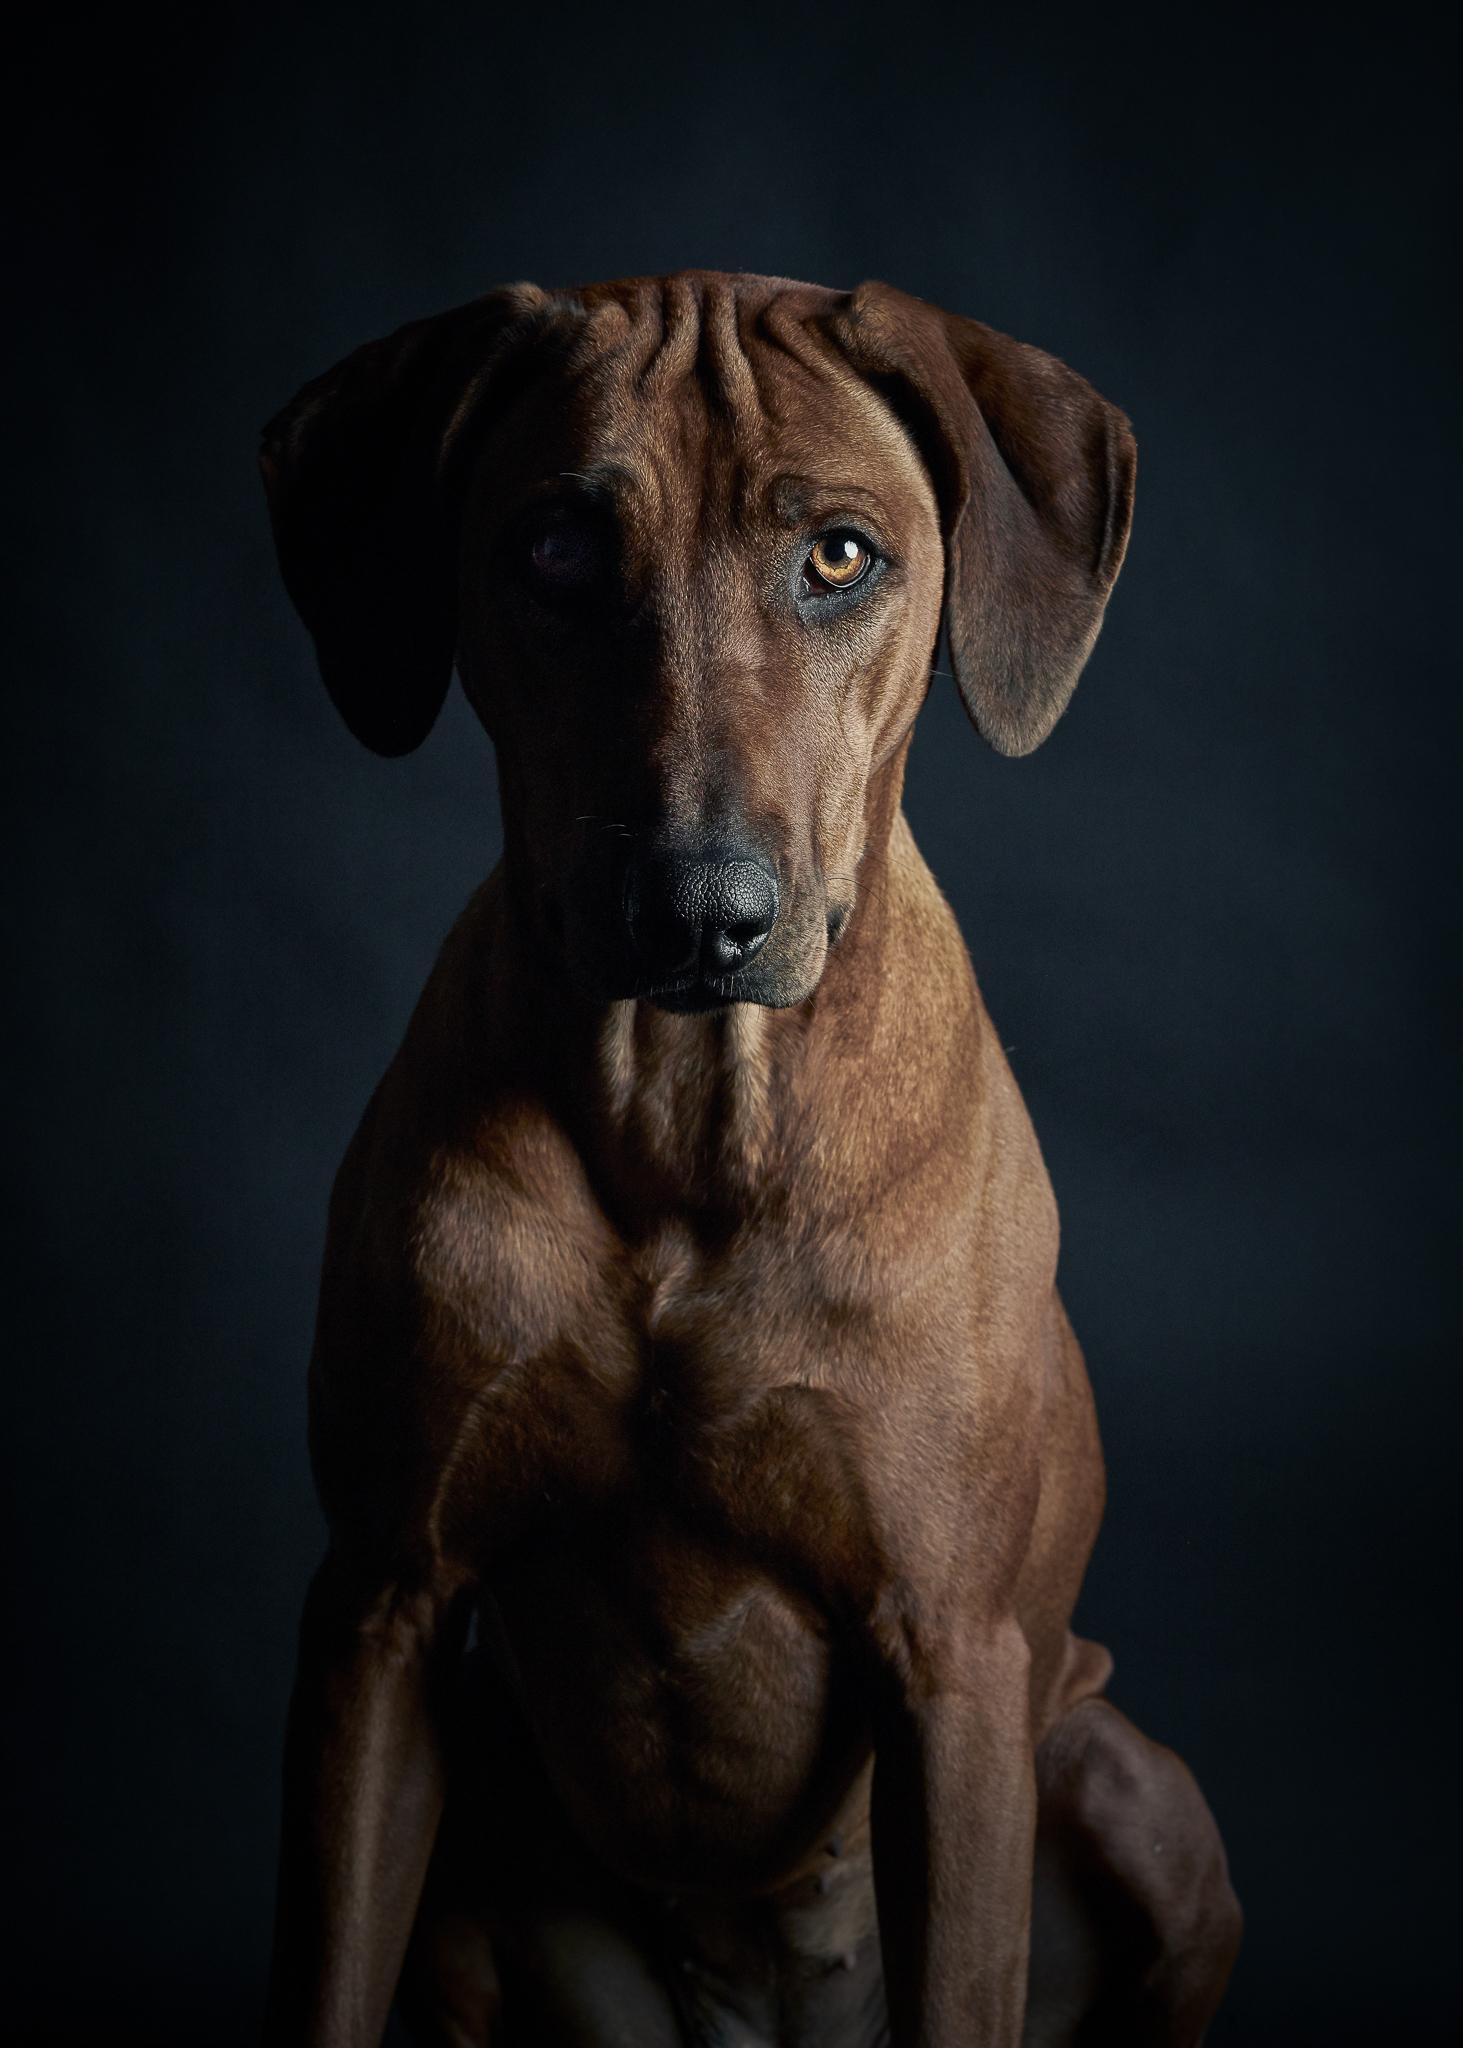 klaus-dyba-dog-photography-1.jpg